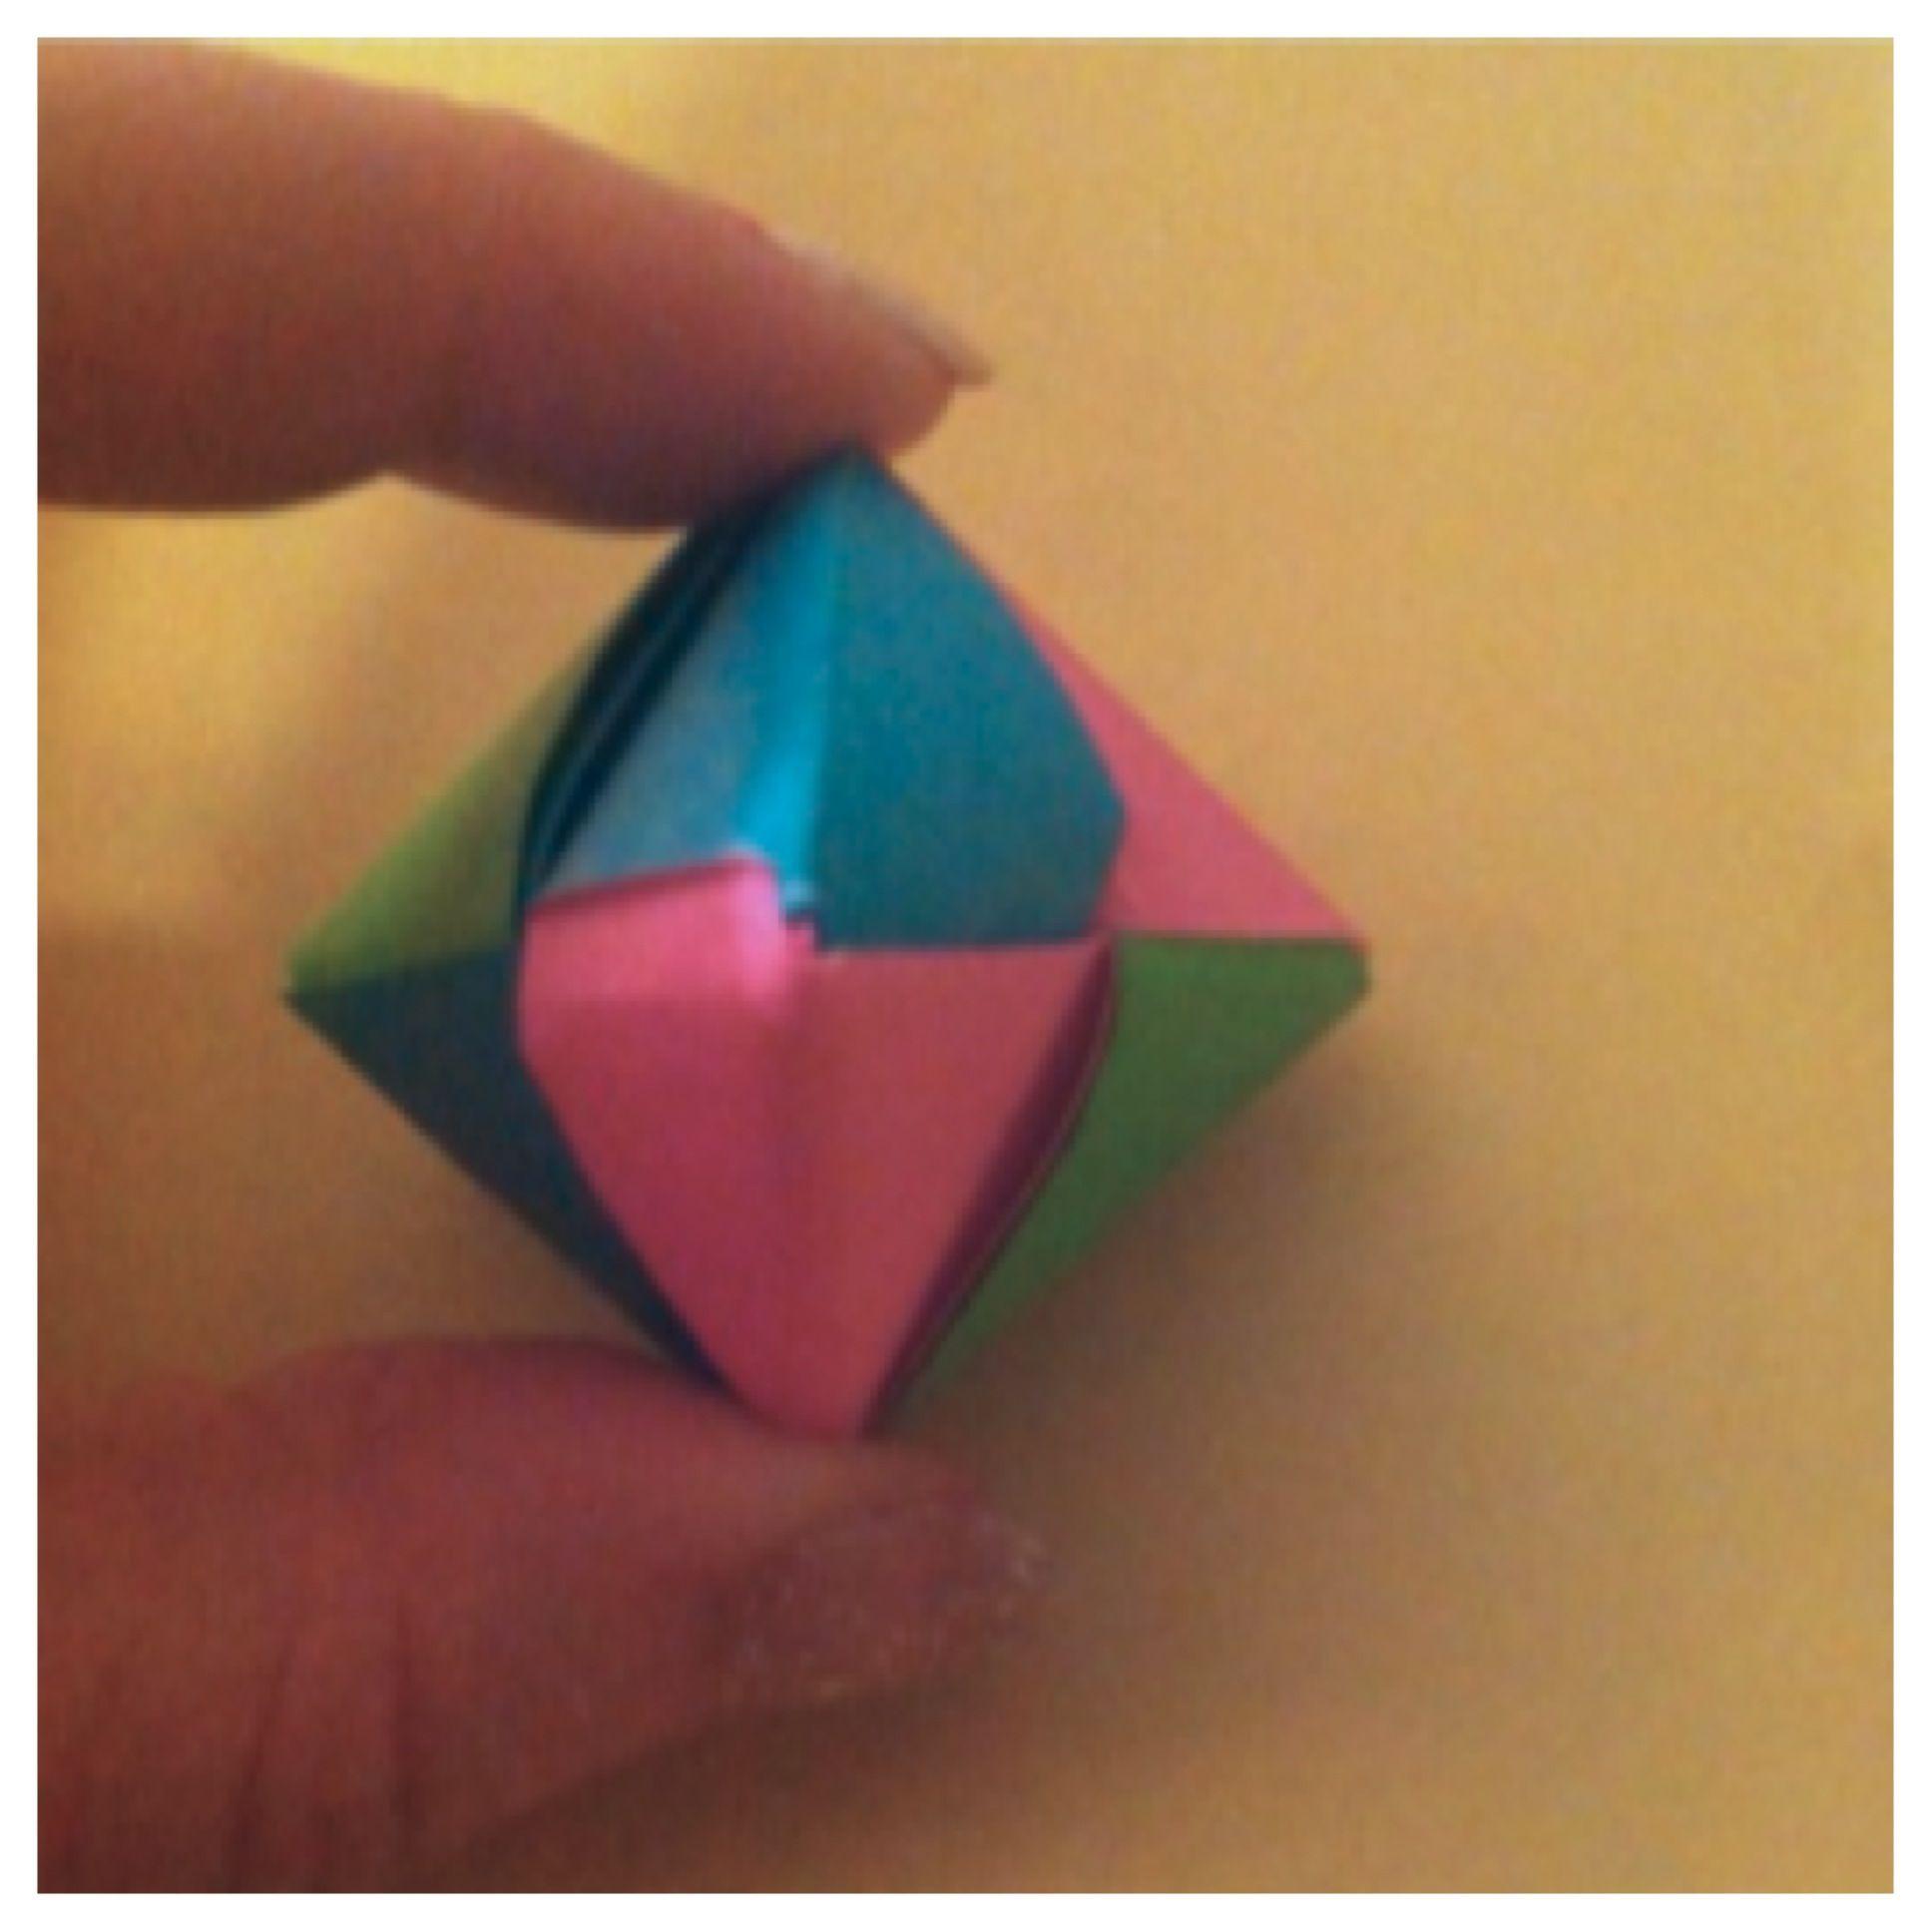 How To Make Origami Jewel Pop Recipe Origami Jewel And Craft